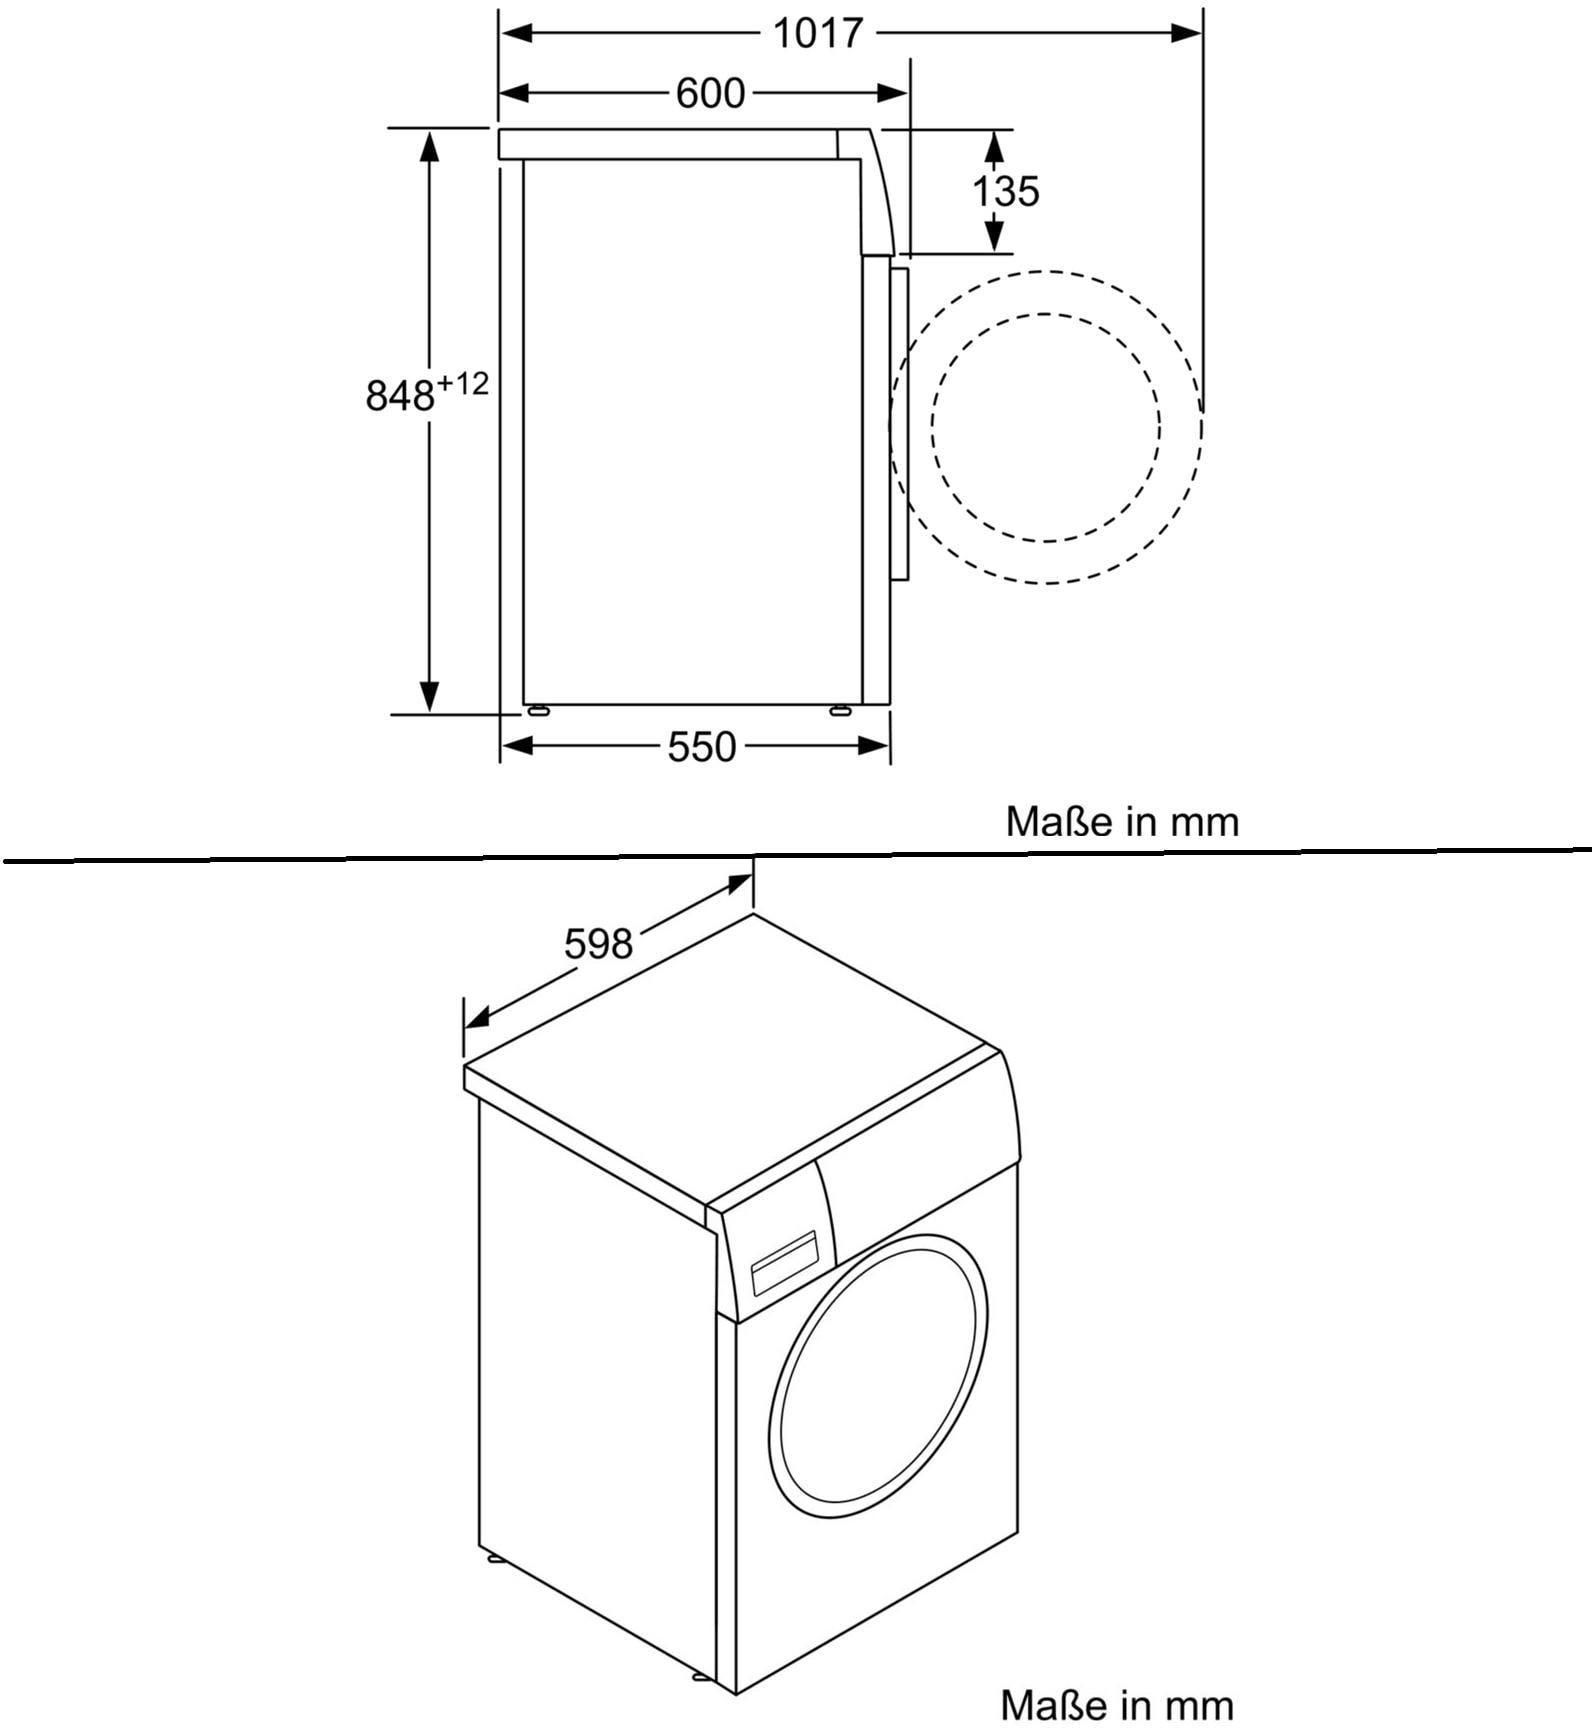 Siemens WM14N2G1 iQ300 A+++ Waschmaschine, 7 kg, 1400 U/min, Knitterschutz,  super 30/15